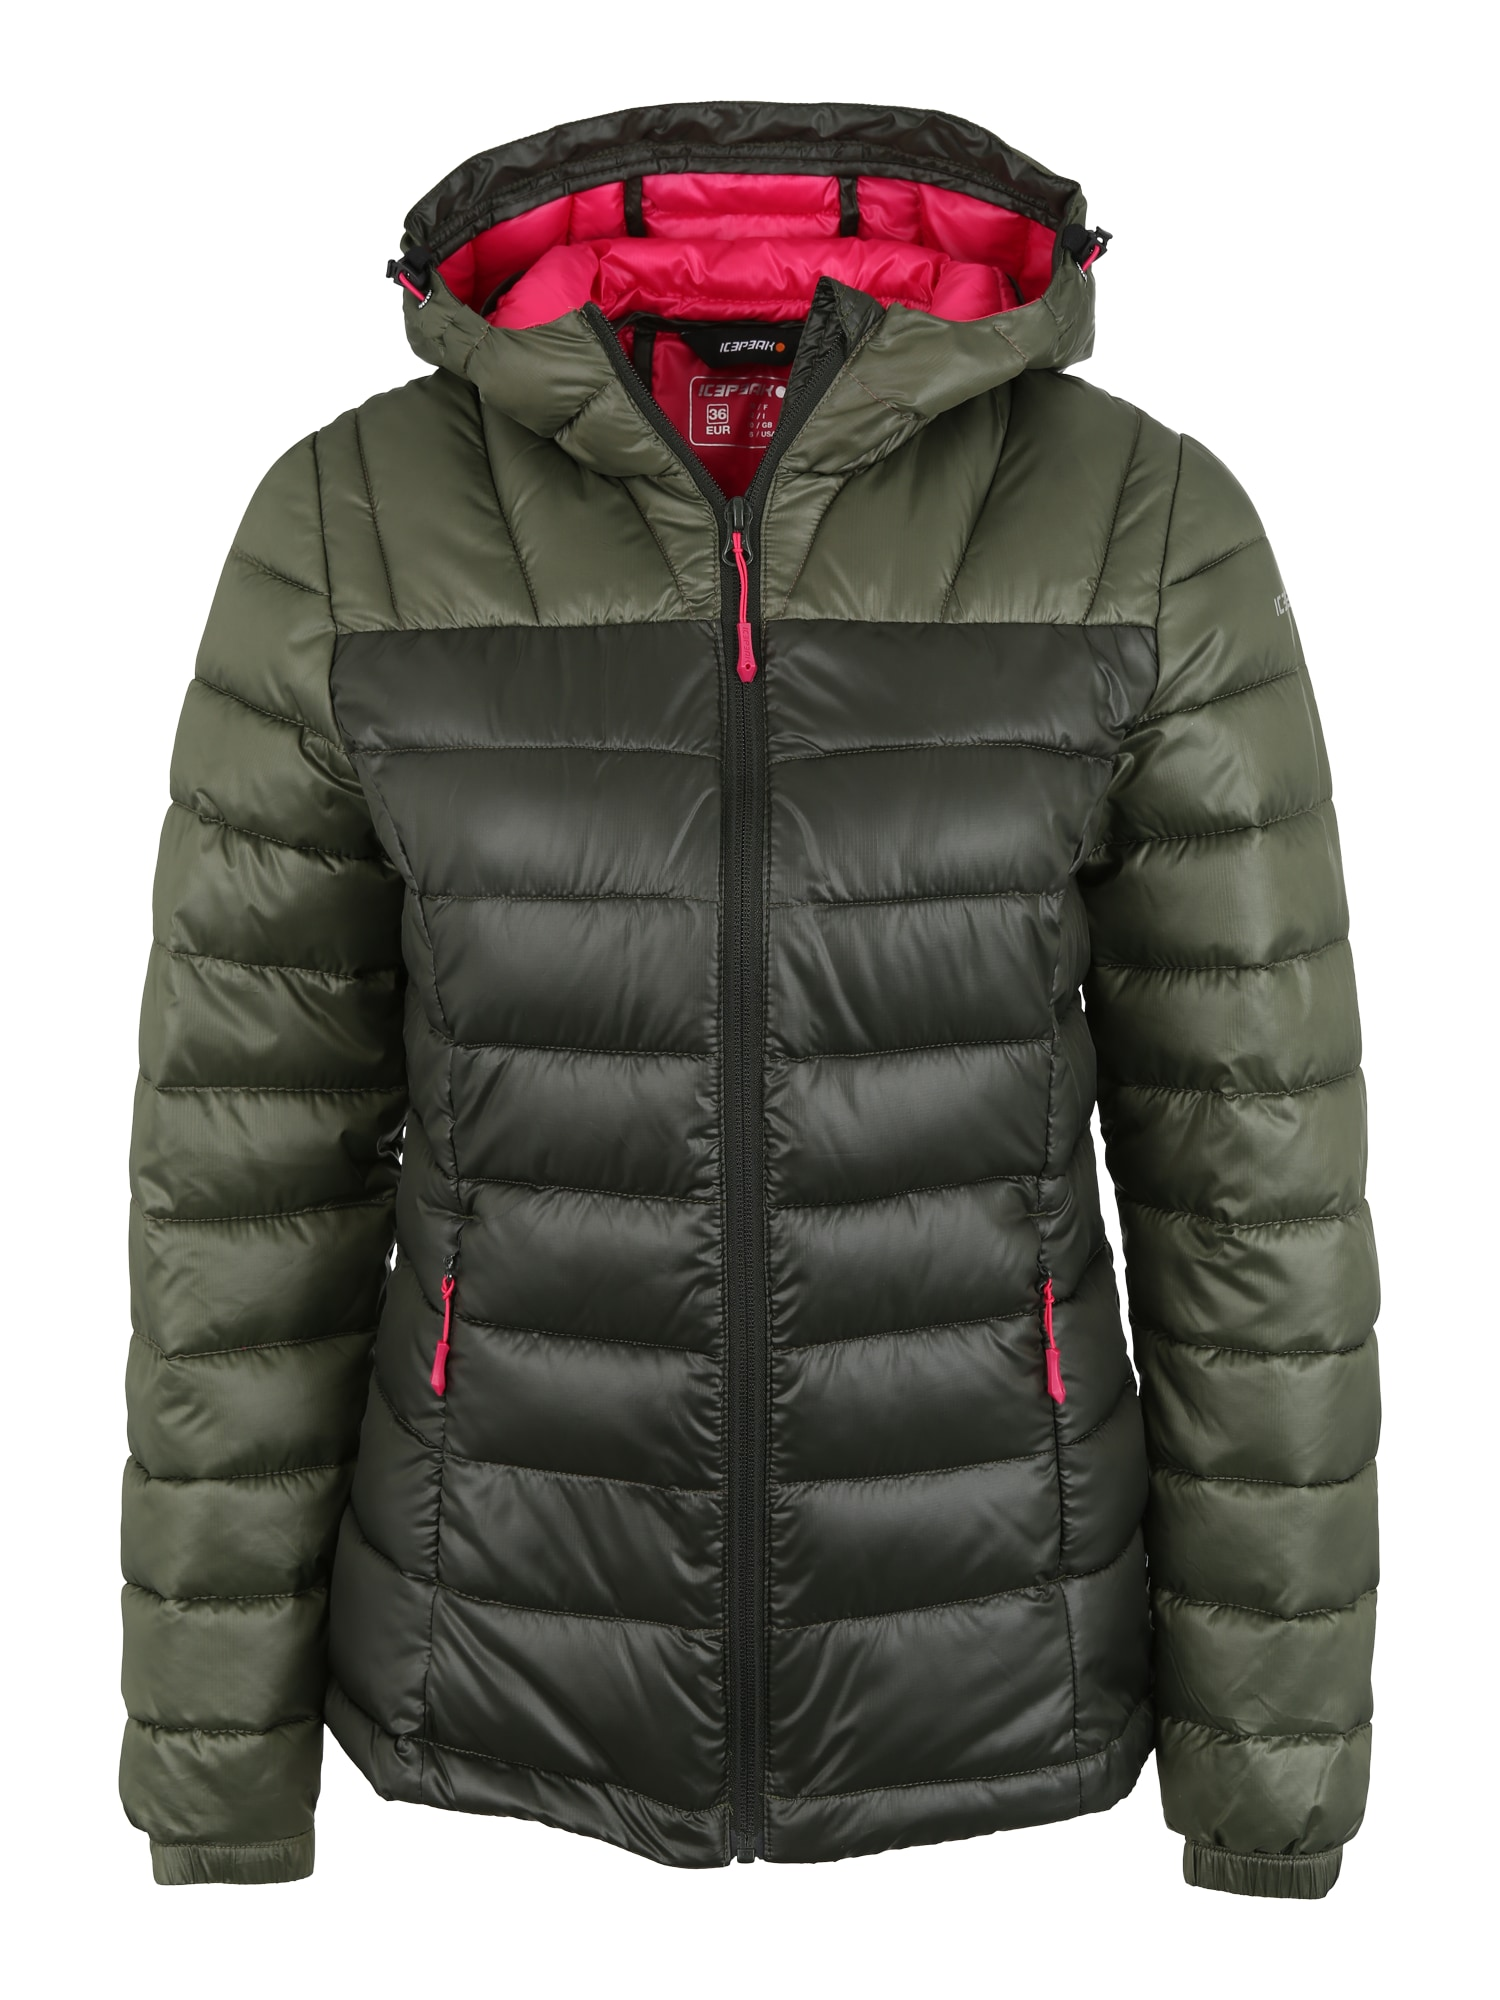 Outdoorová bunda Layan khaki černá ICEPEAK